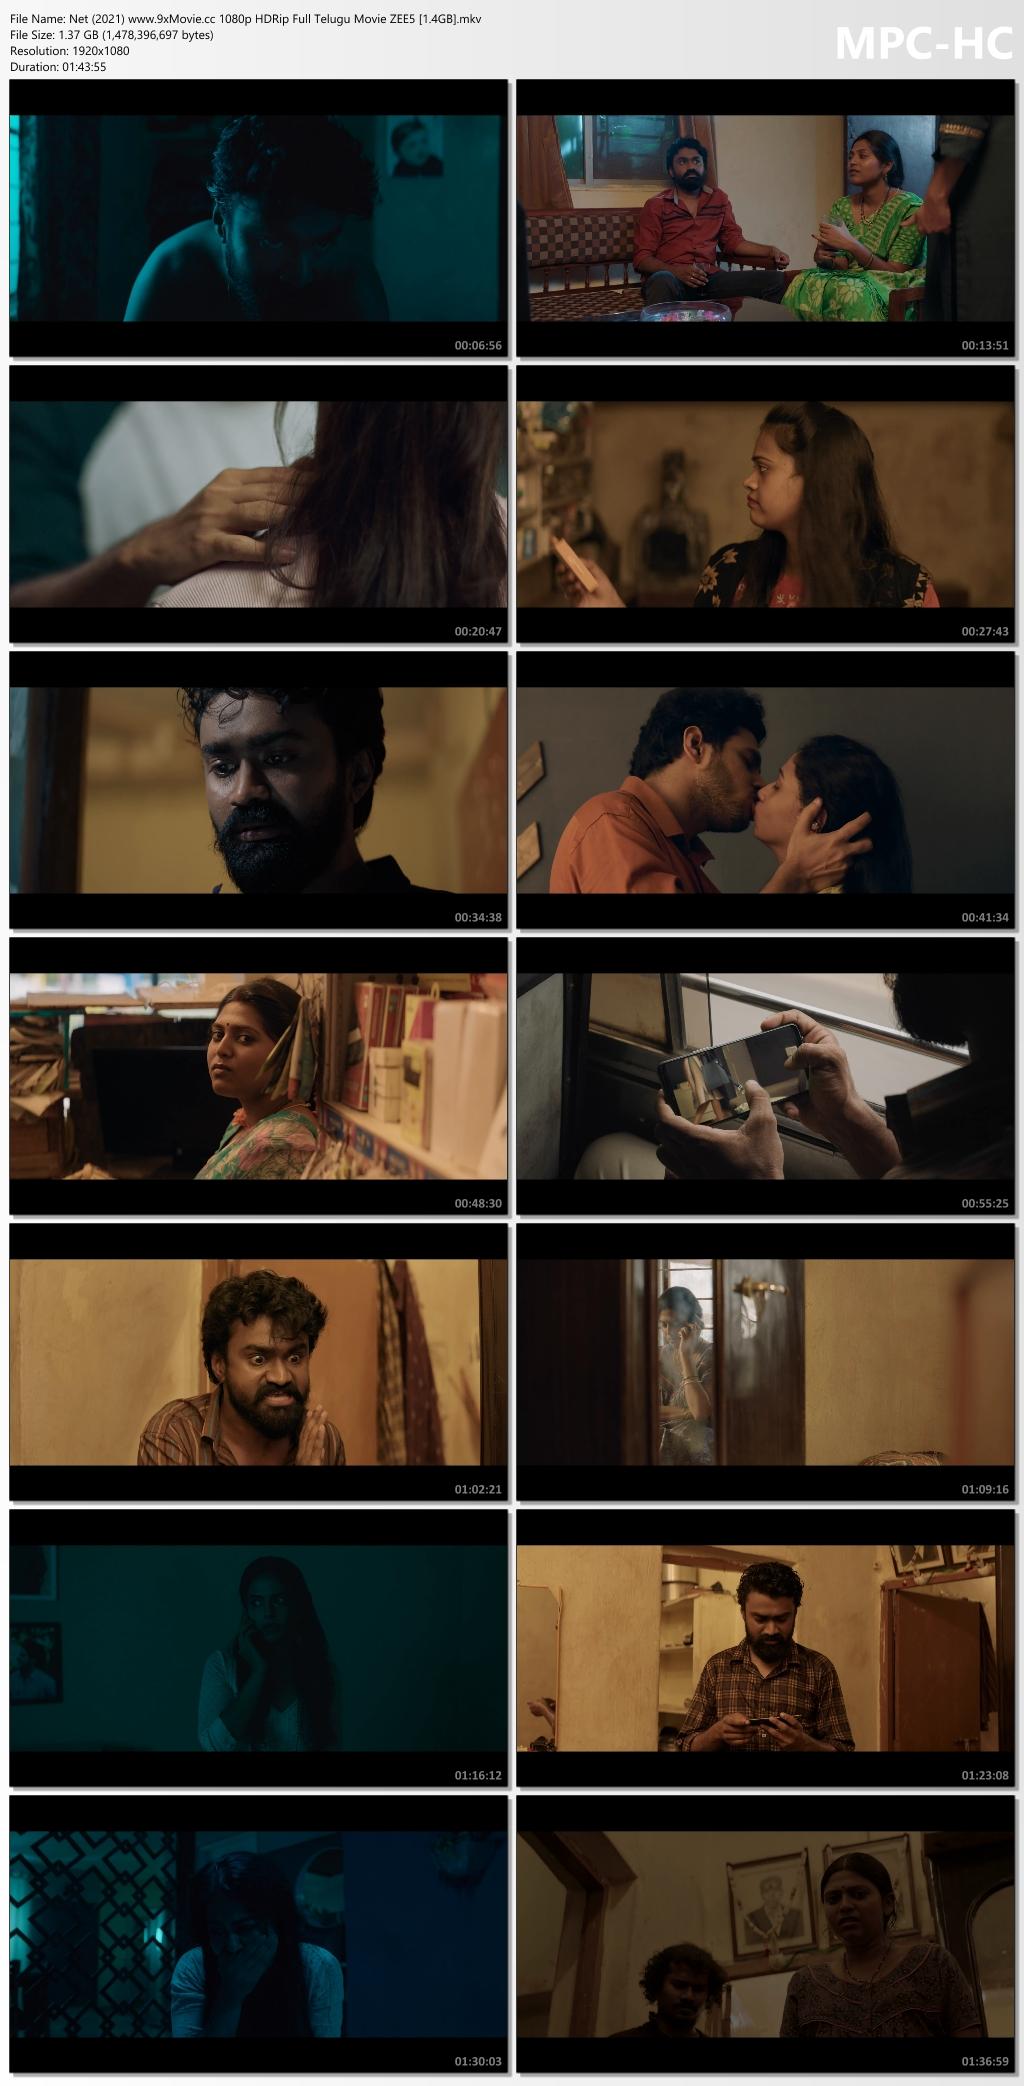 Net-2021-www-9x-Movie-cc-1080p-HDRip-Full-Telugu-Movie-ZEE5-1-4-GB-mkv